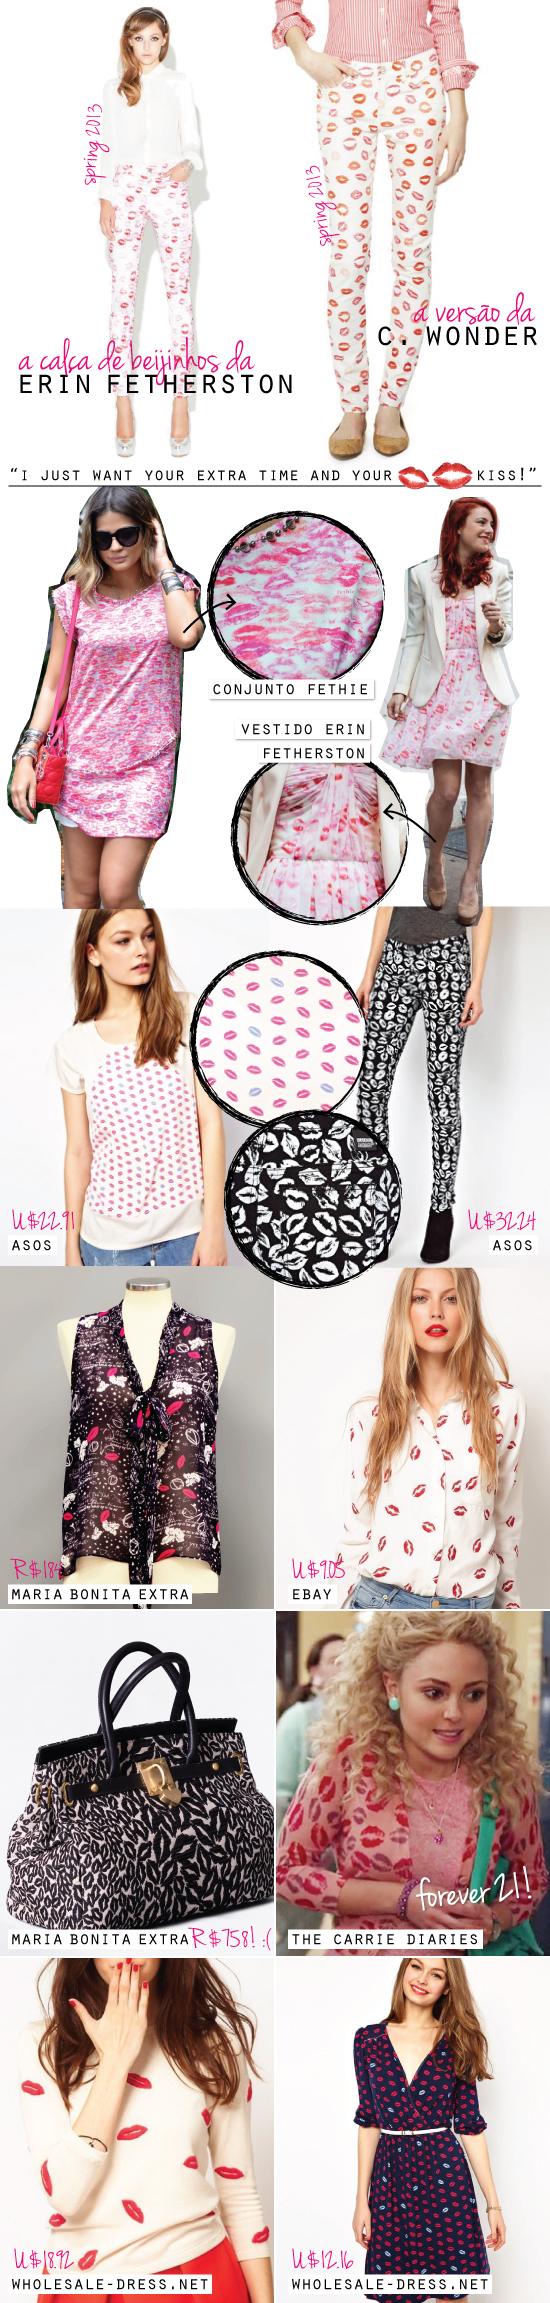 lips-estampa-print-pattern-estampa-beijos-boca-vestido-blusa-onde-comprar-fethie-blog-da-thassia-naves-erin-fetherston-c-wonder-calca-estampada-diy-asos-carrie-diaries-cardigan-forever-21-maria-bonita-extra-bolsa-blusa-casaco-ebay-barato